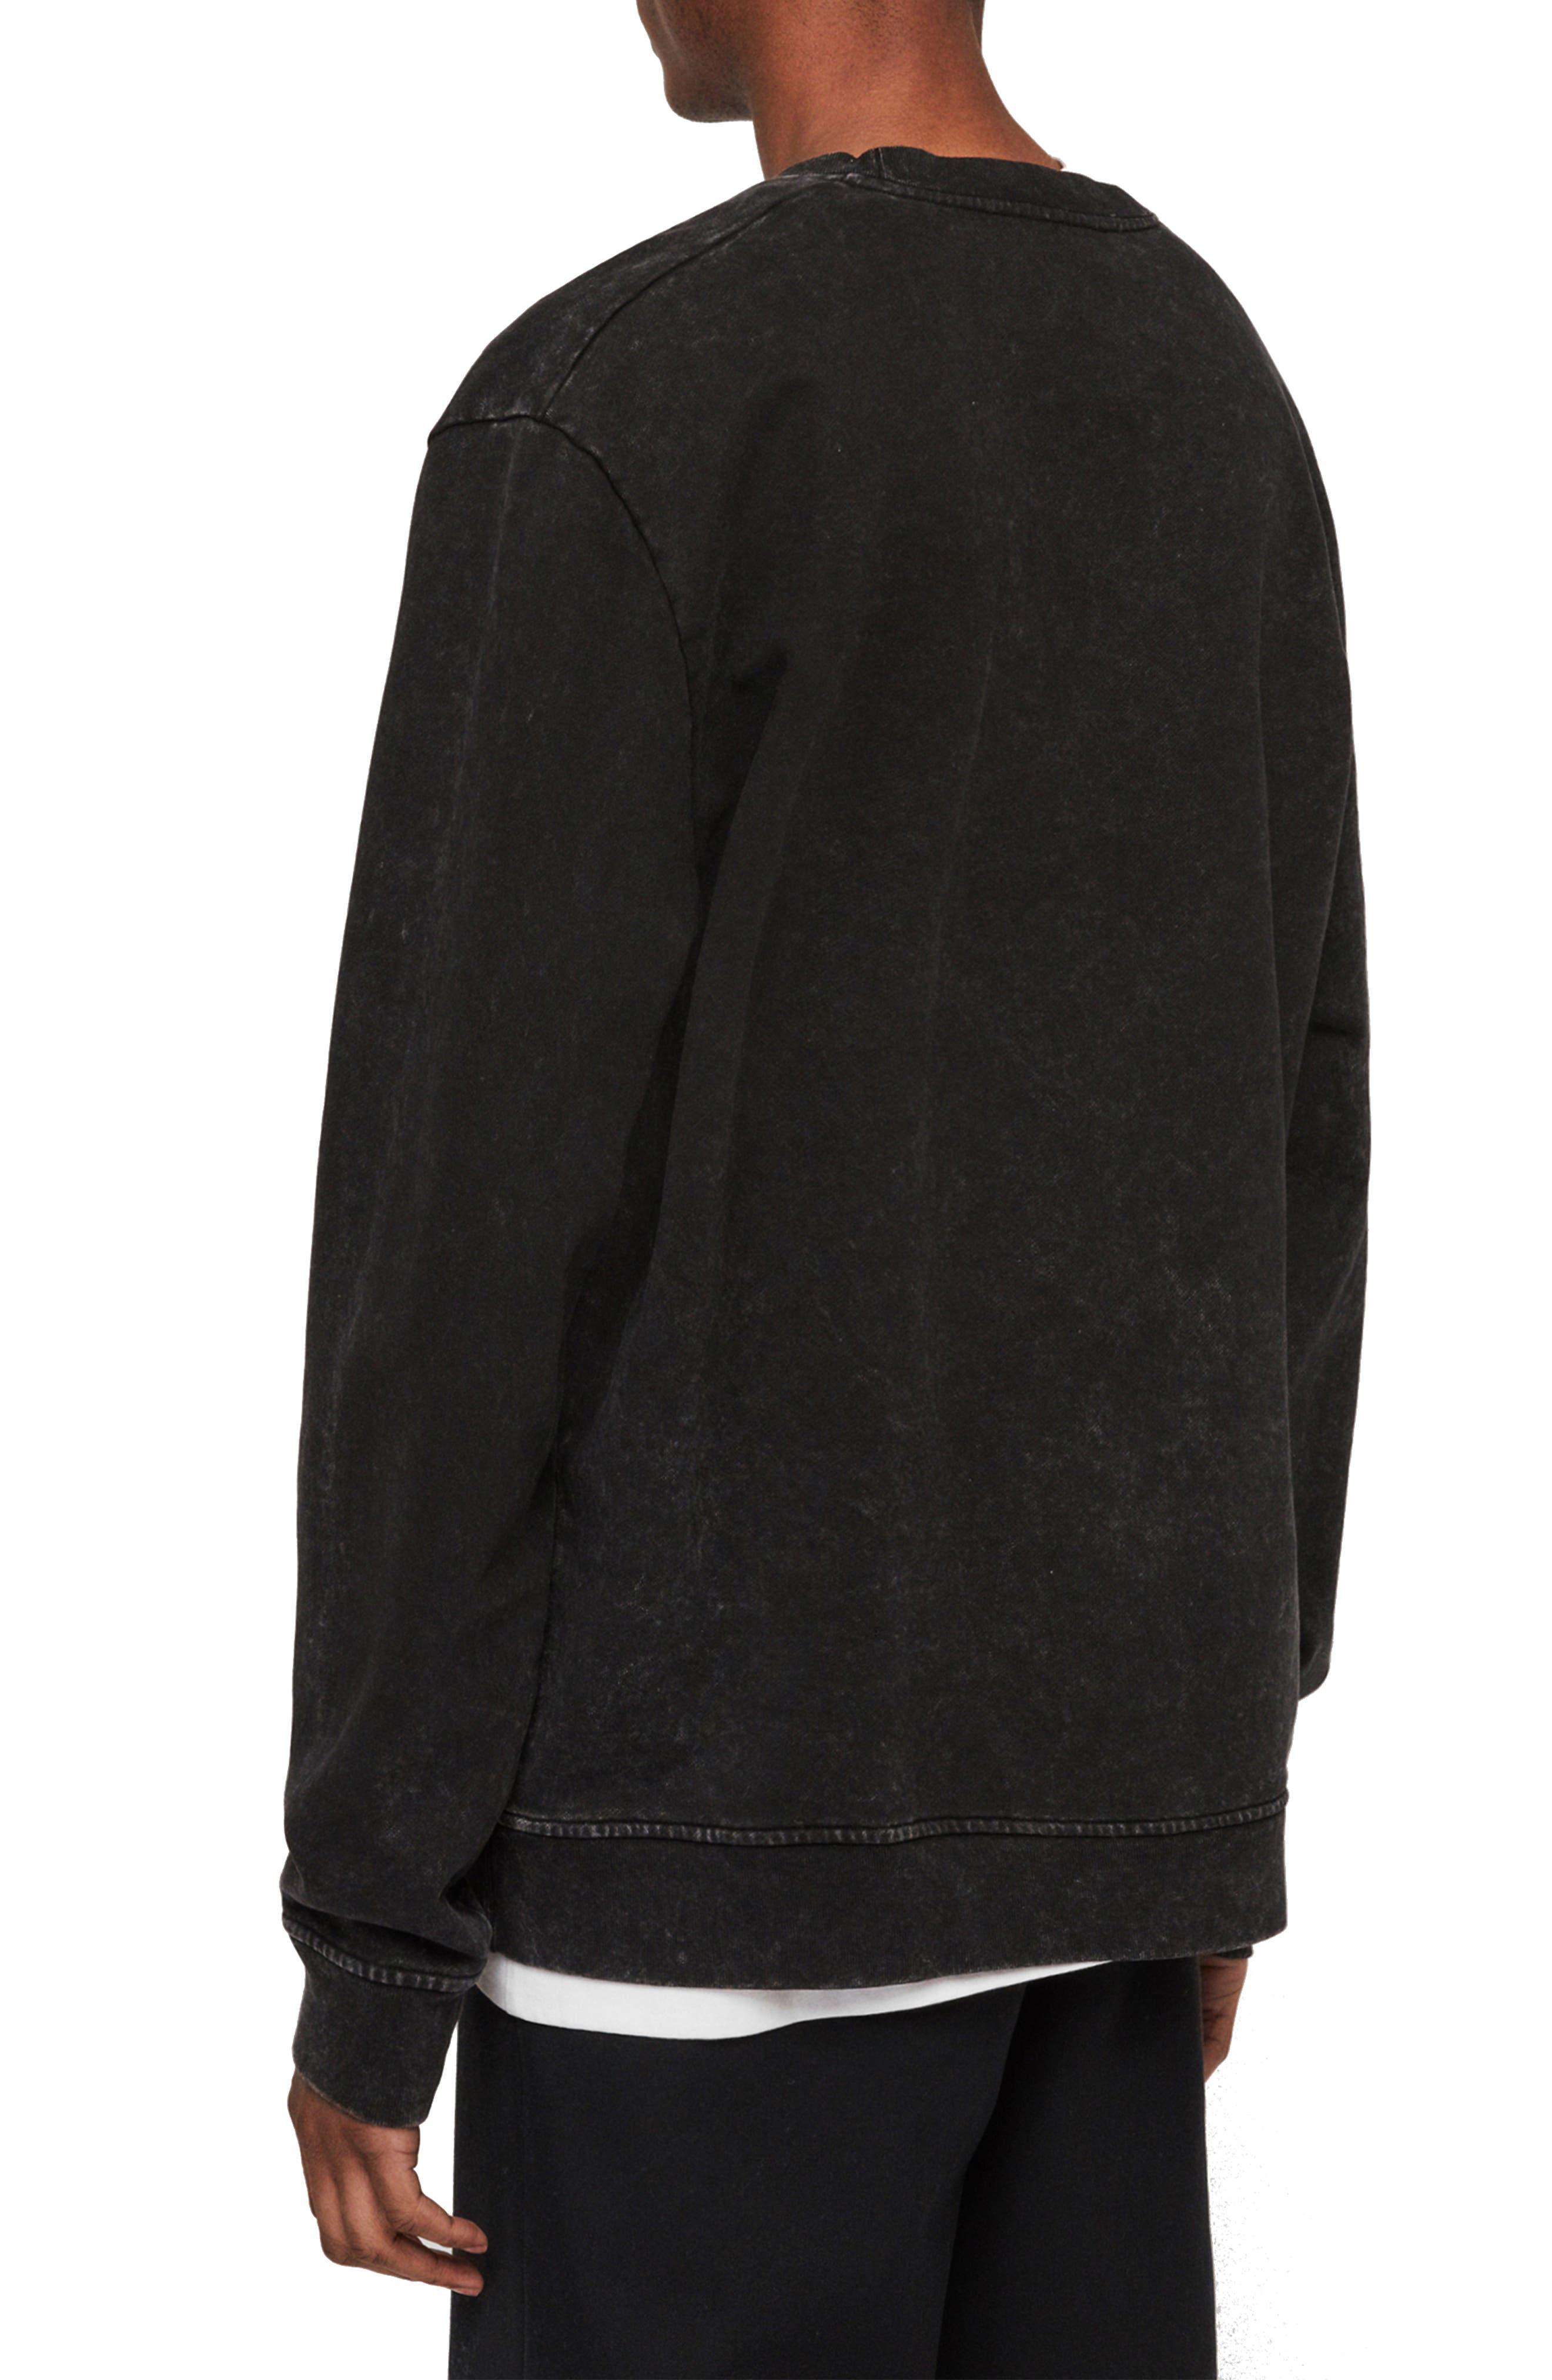 ALLSAINTS, Brackets Logo Graphic Fleece Sweatshirt, Alternate thumbnail 2, color, ACID WASHED BLACK